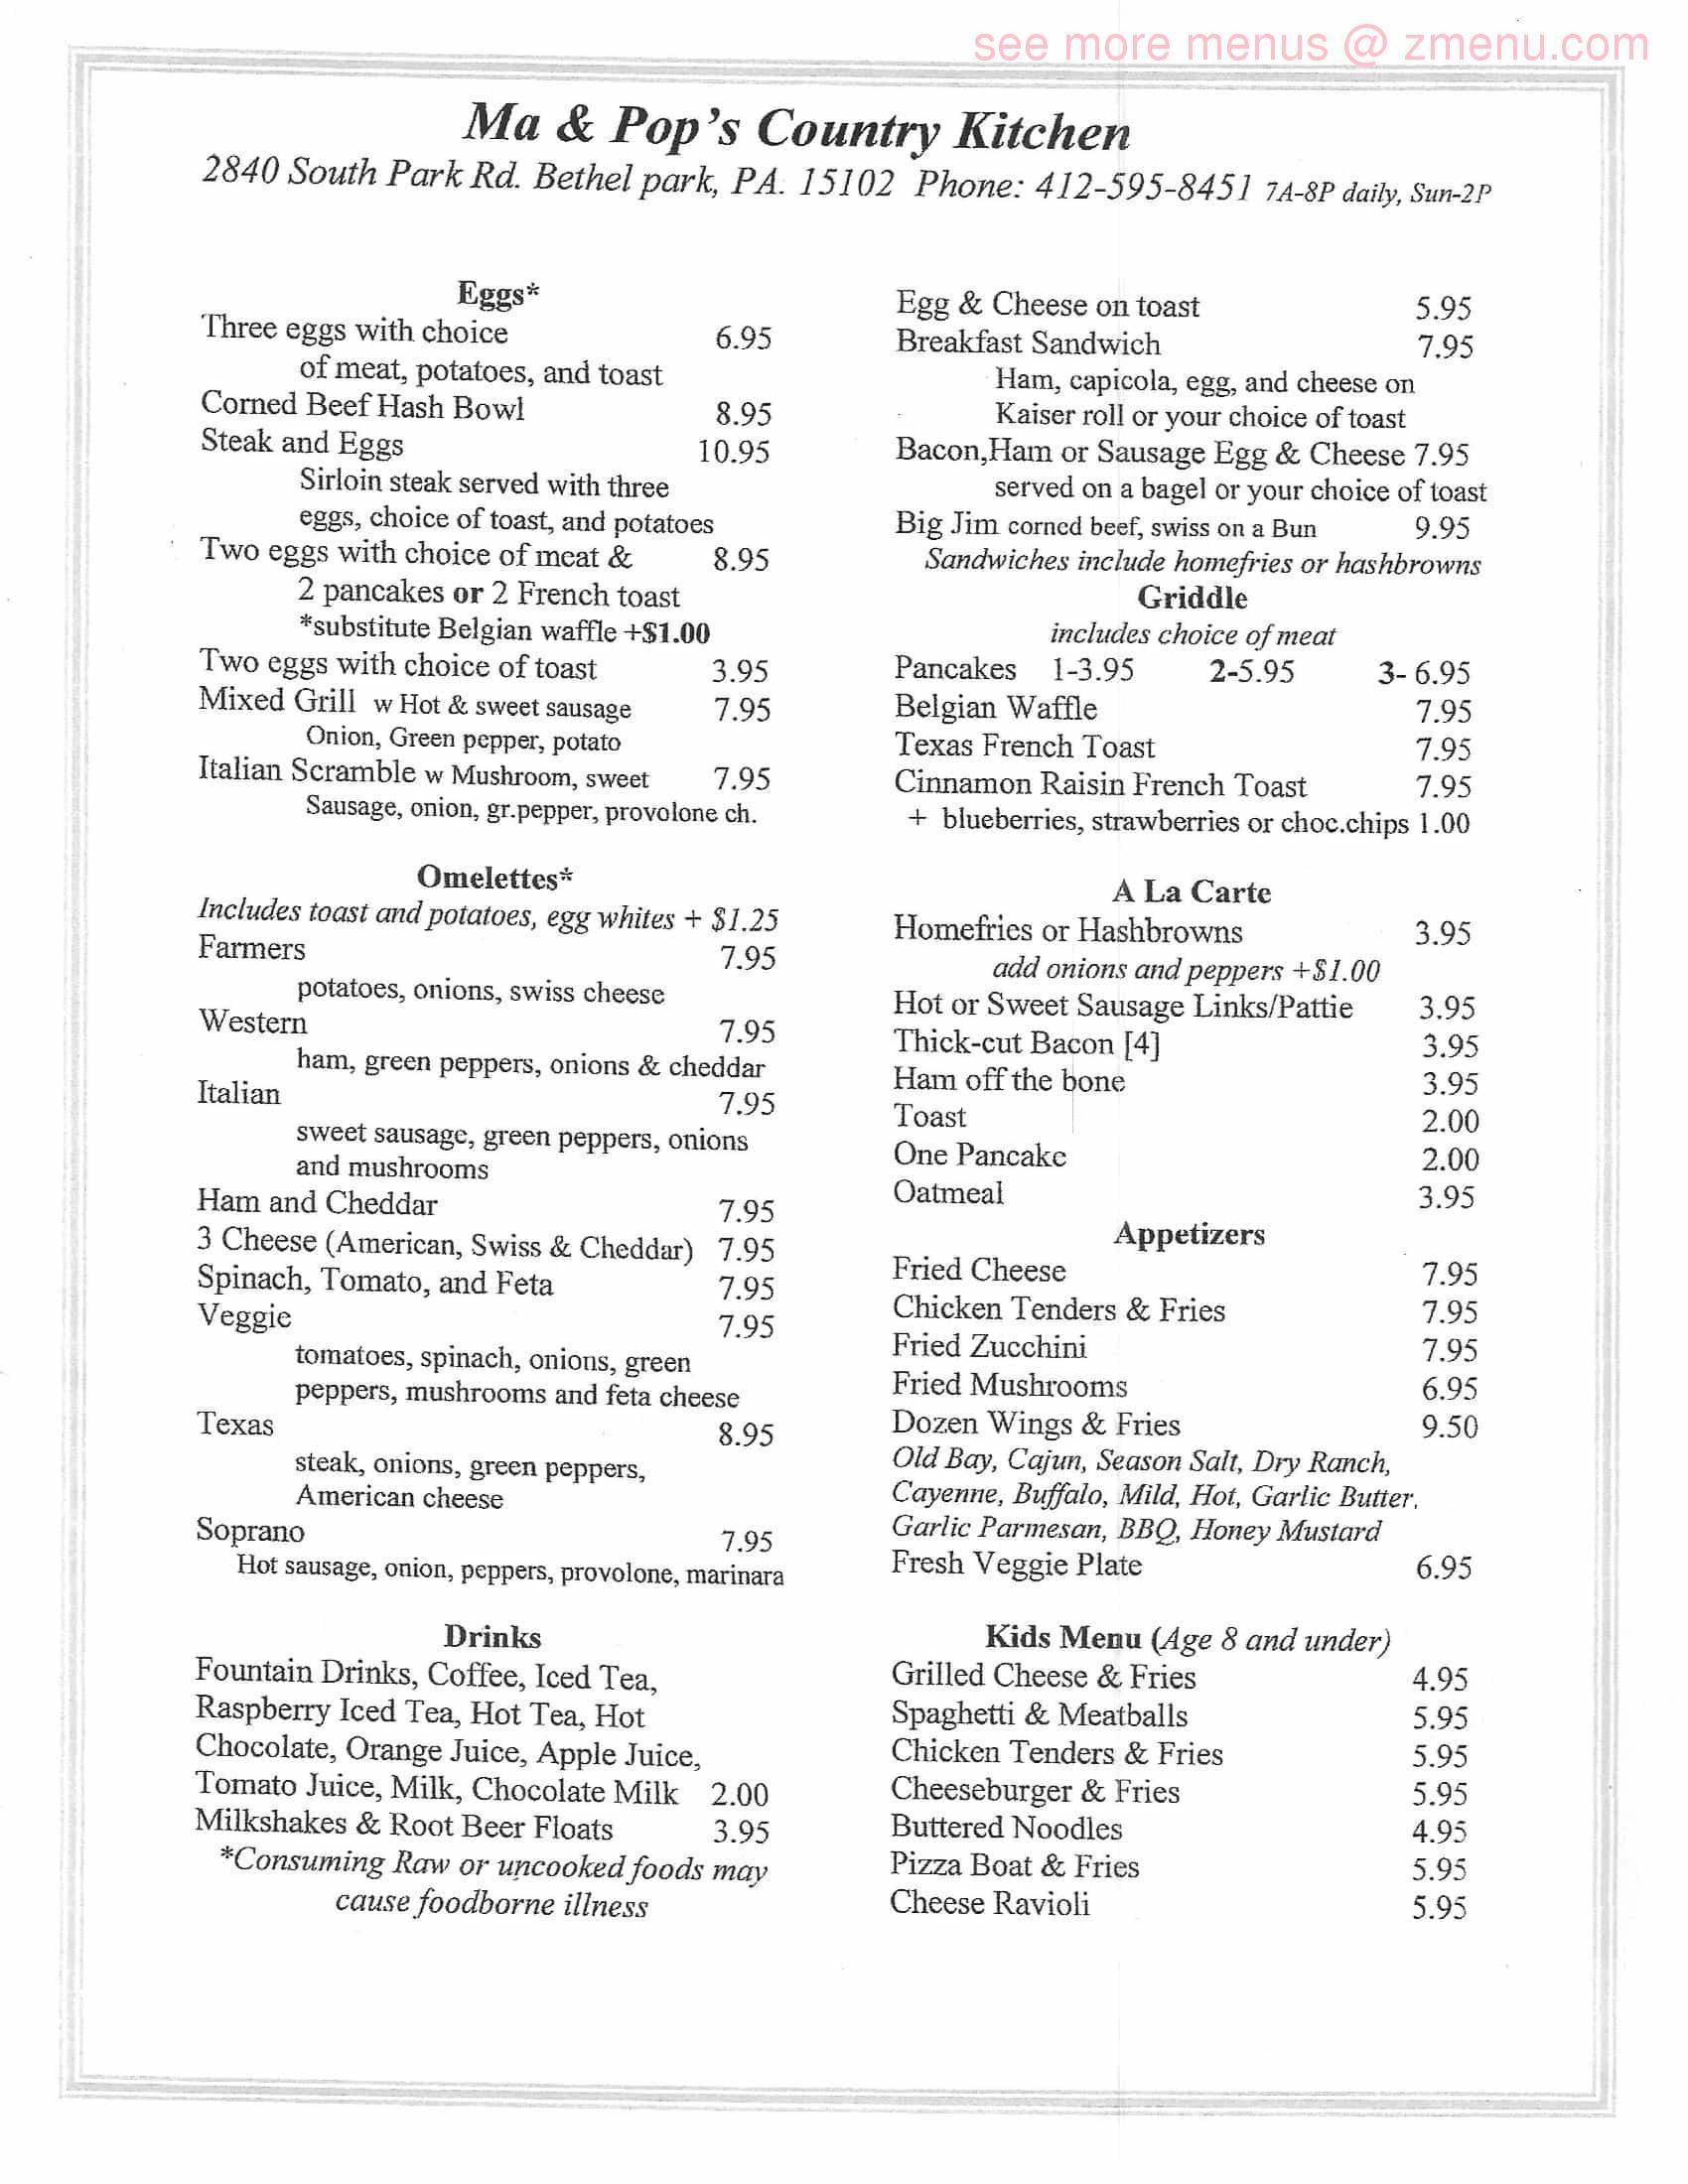 Online Menu Of Ma Pops Country Kitchen Restaurant Bethel Park Pennsylvania 15102 Zmenu